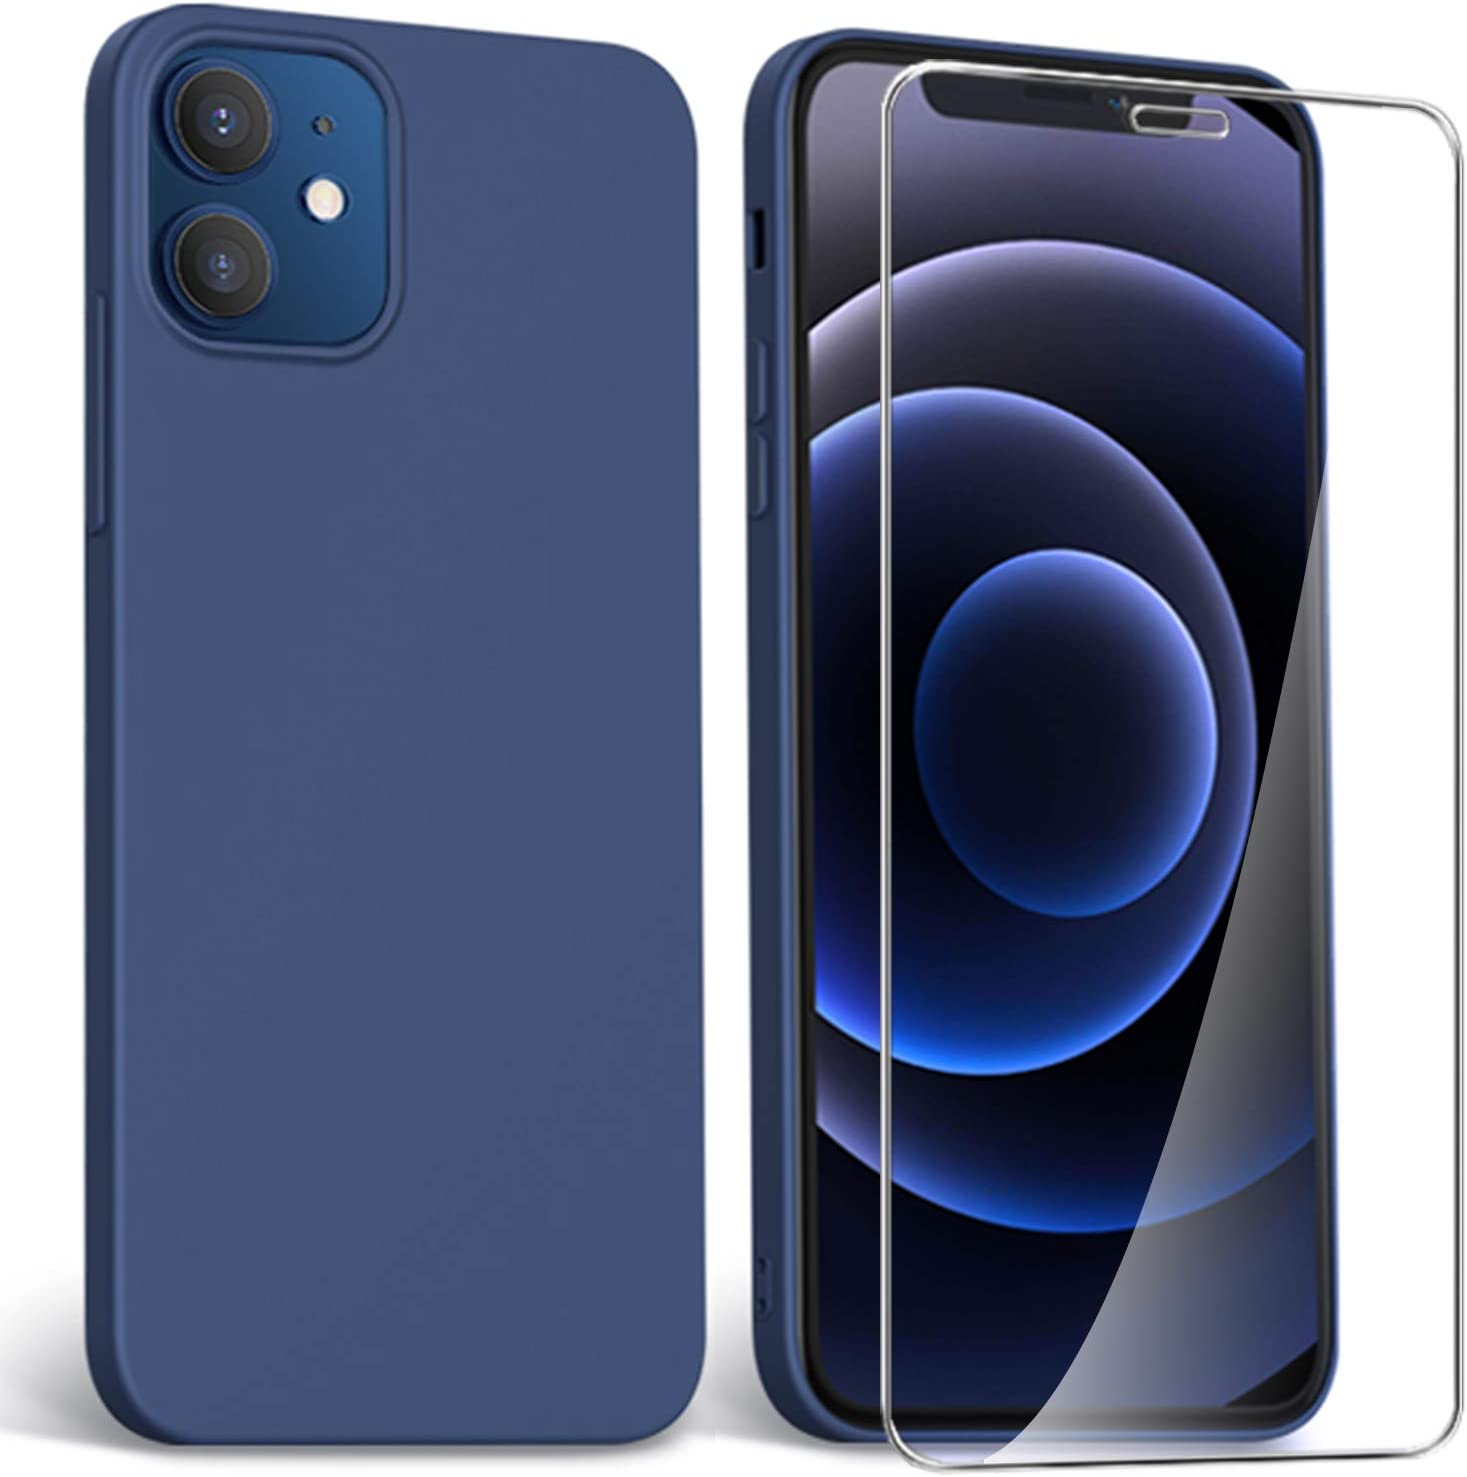 ARRYNN Funda para iPhone 12 Mini + protector de pantalla de cristal blindado, funda líquida de silicona TPU para iPhone 12 Mini 5,4 pulgadas, color azul